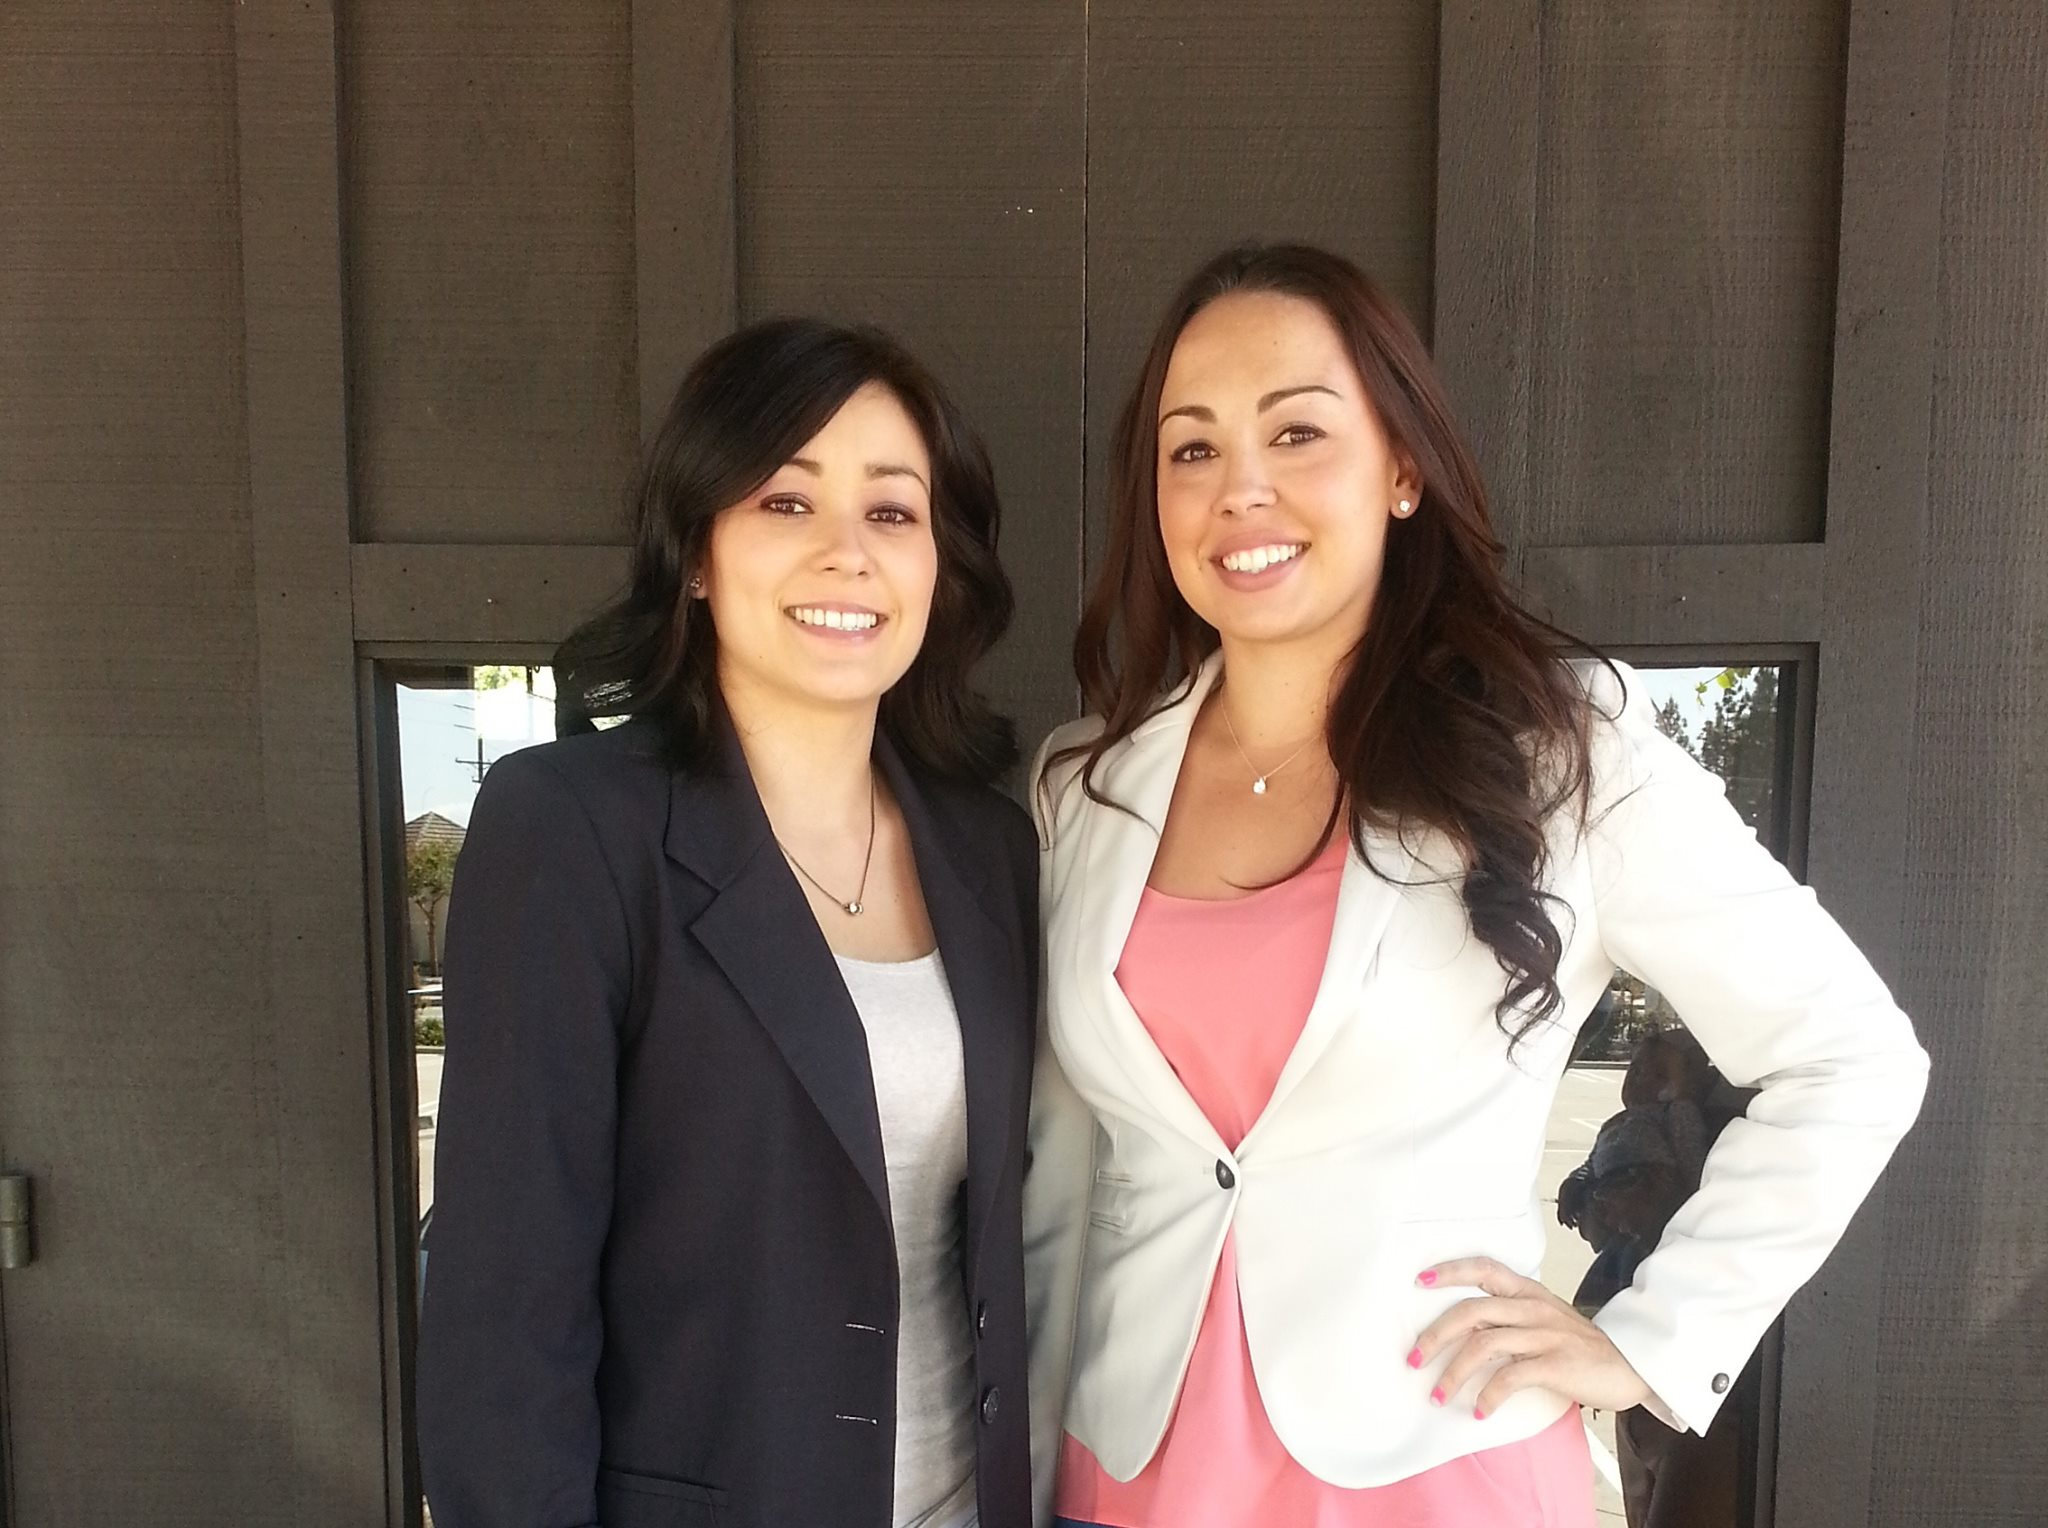 Garcia & Miller, Attorneys at Law